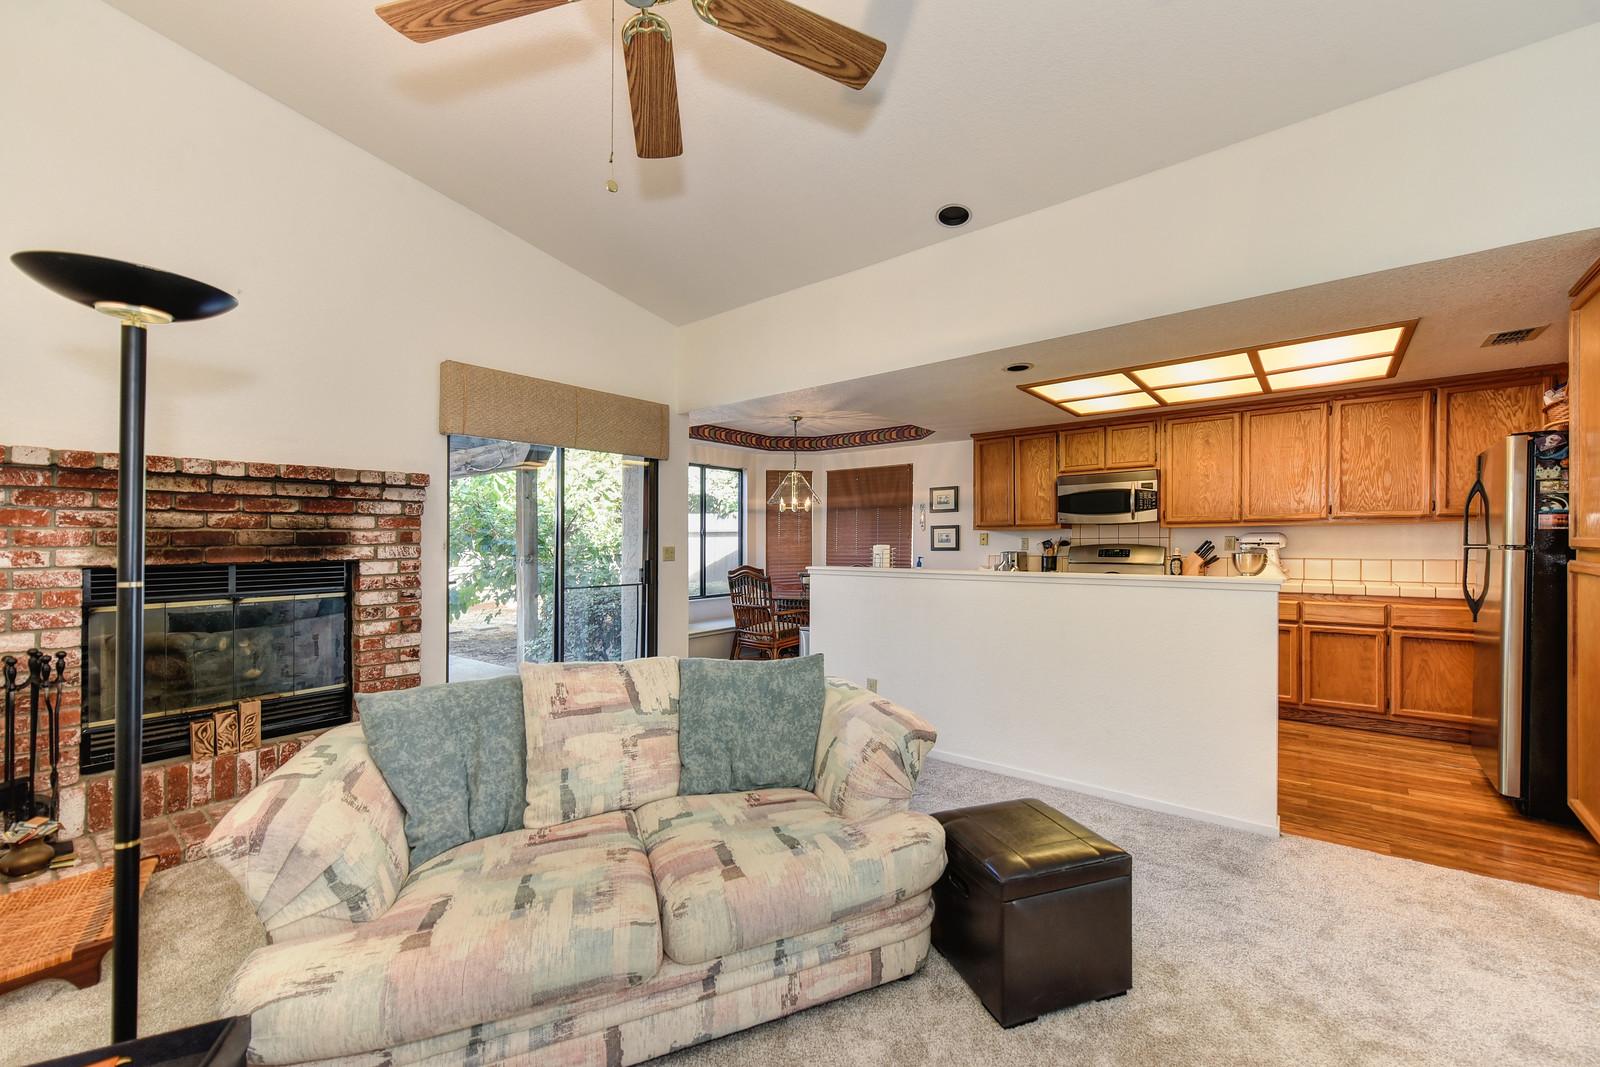 9158 Old Creek Rd Family Room | Keller Williams Realty Elk Grove California